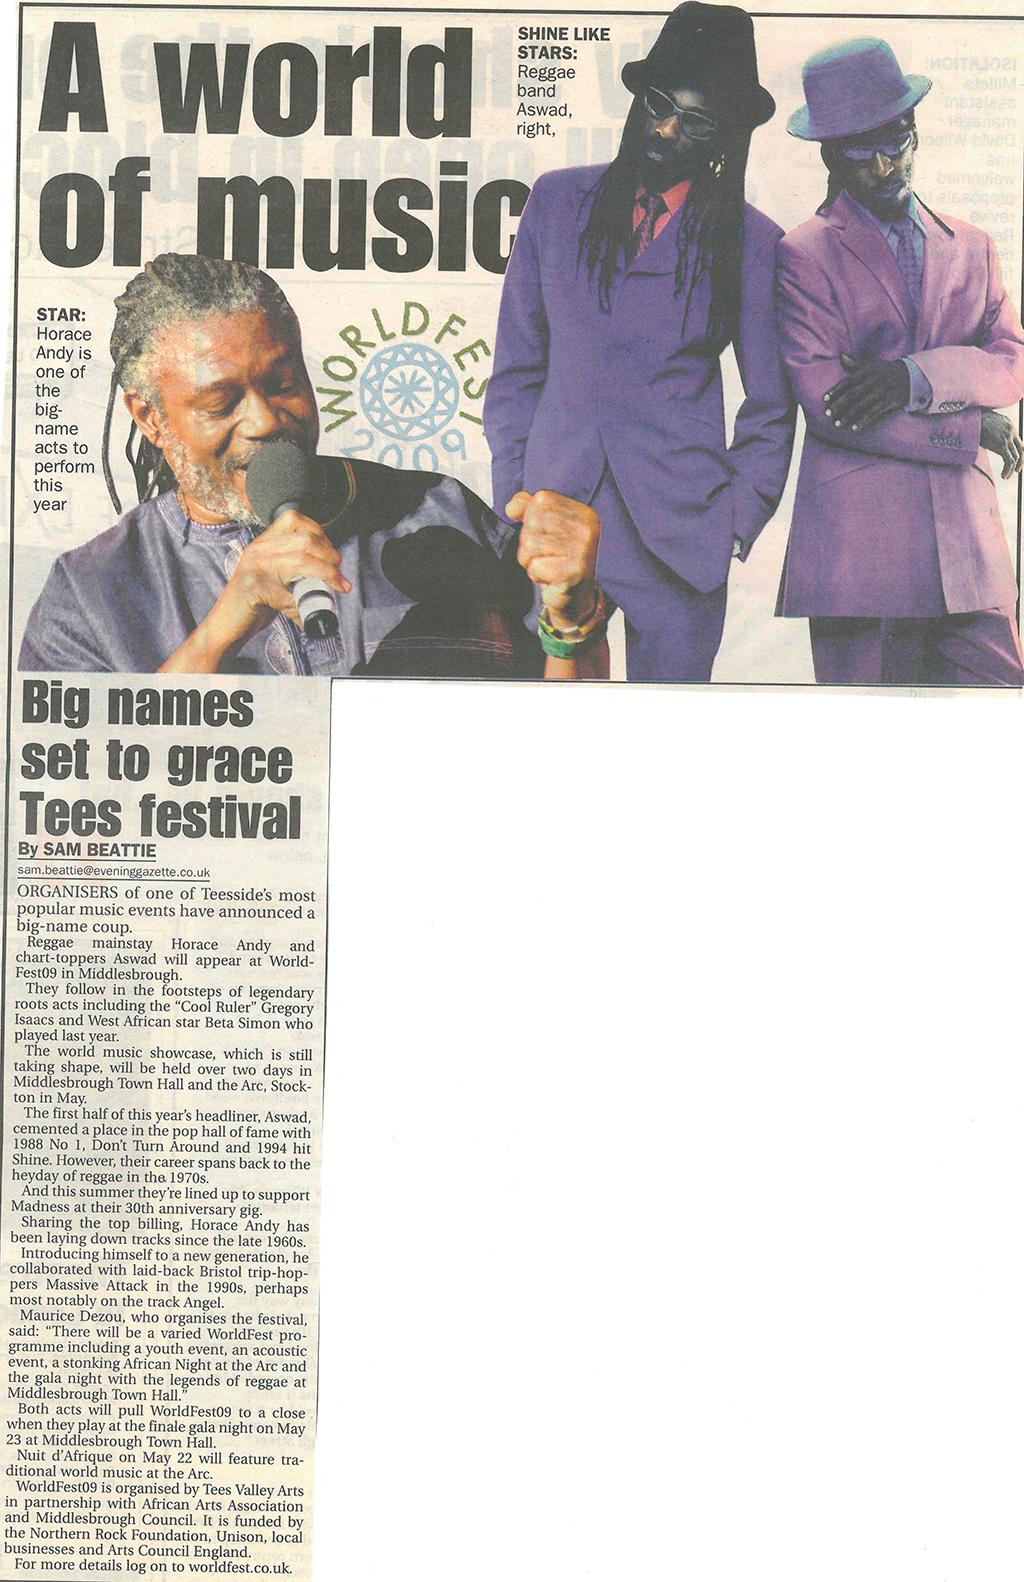 2009-02-17, Evening Gazette